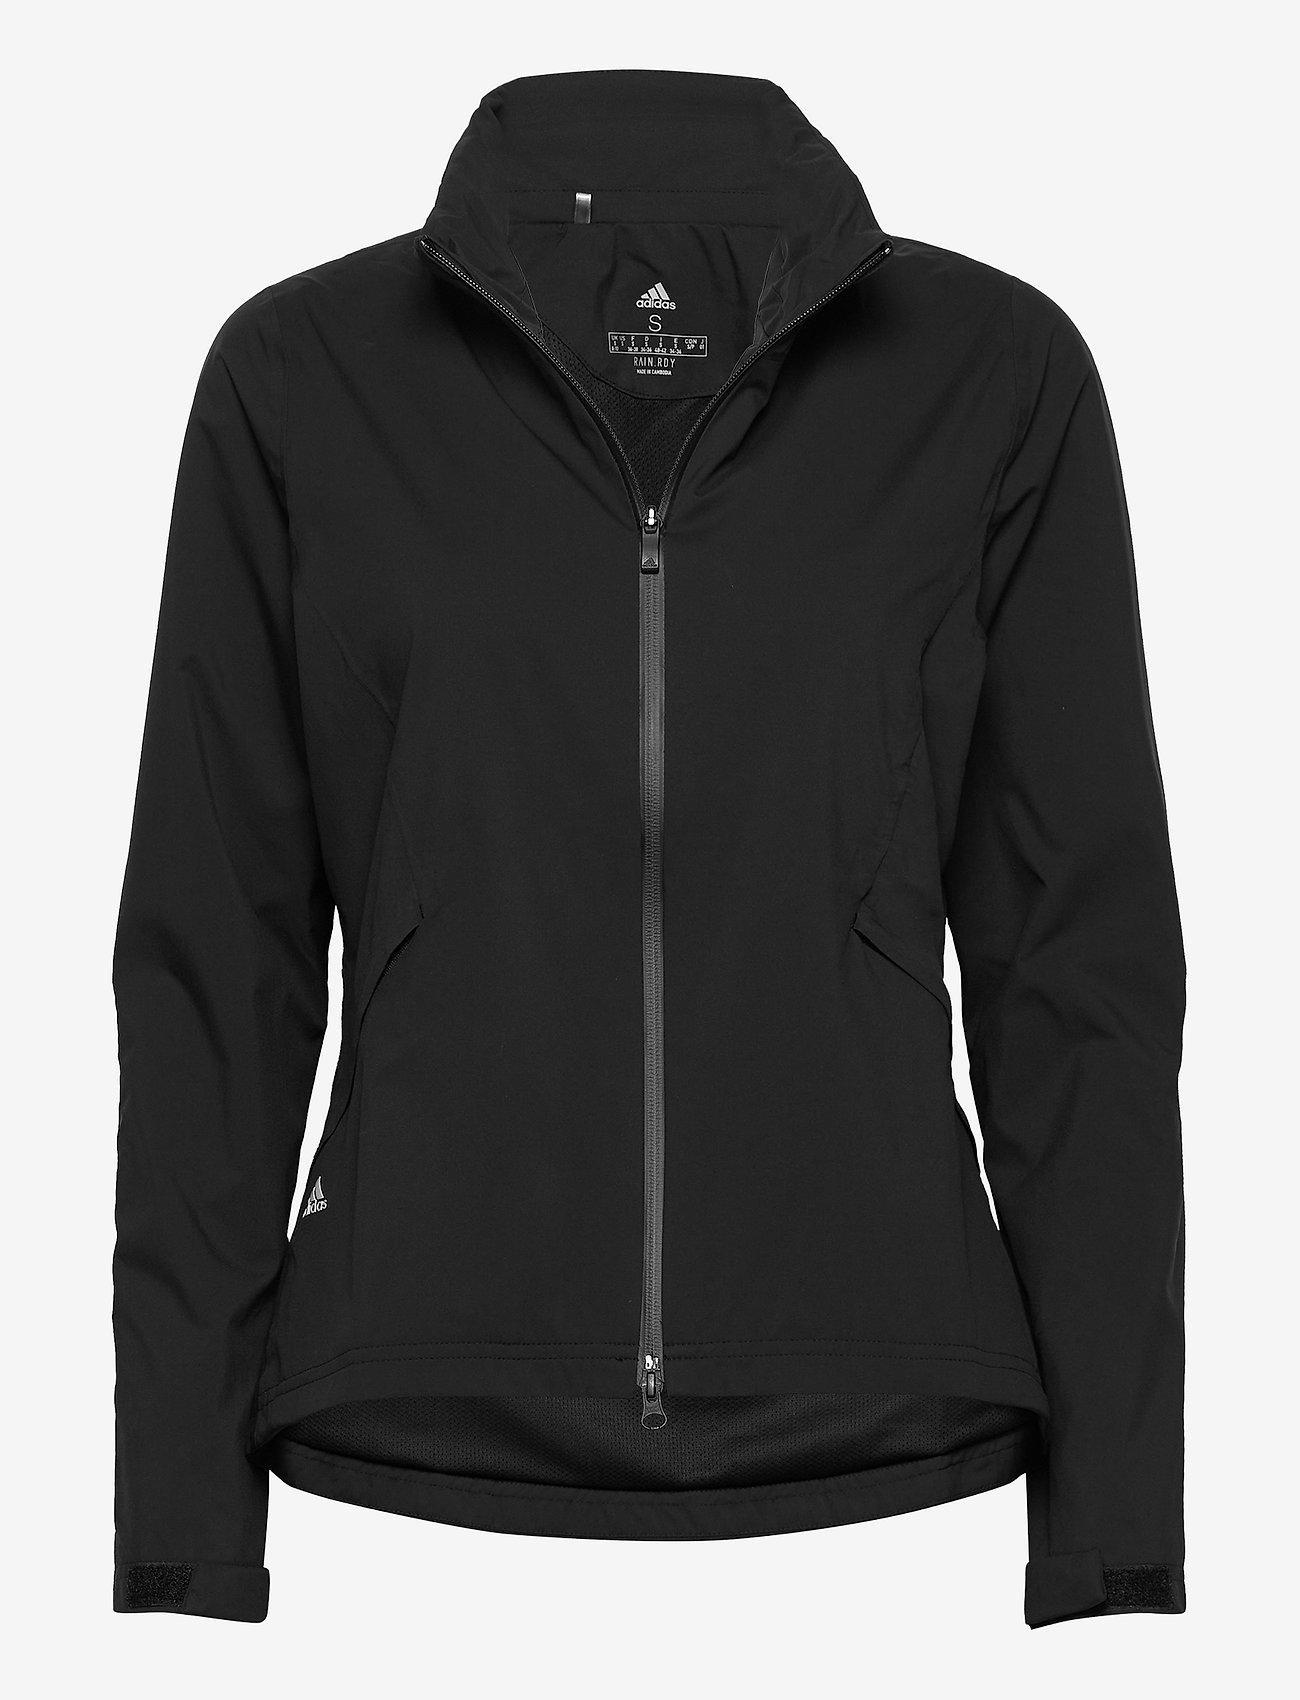 adidas Golf - RAIN.RDY  JKT - kurtki golfowe - black - 1